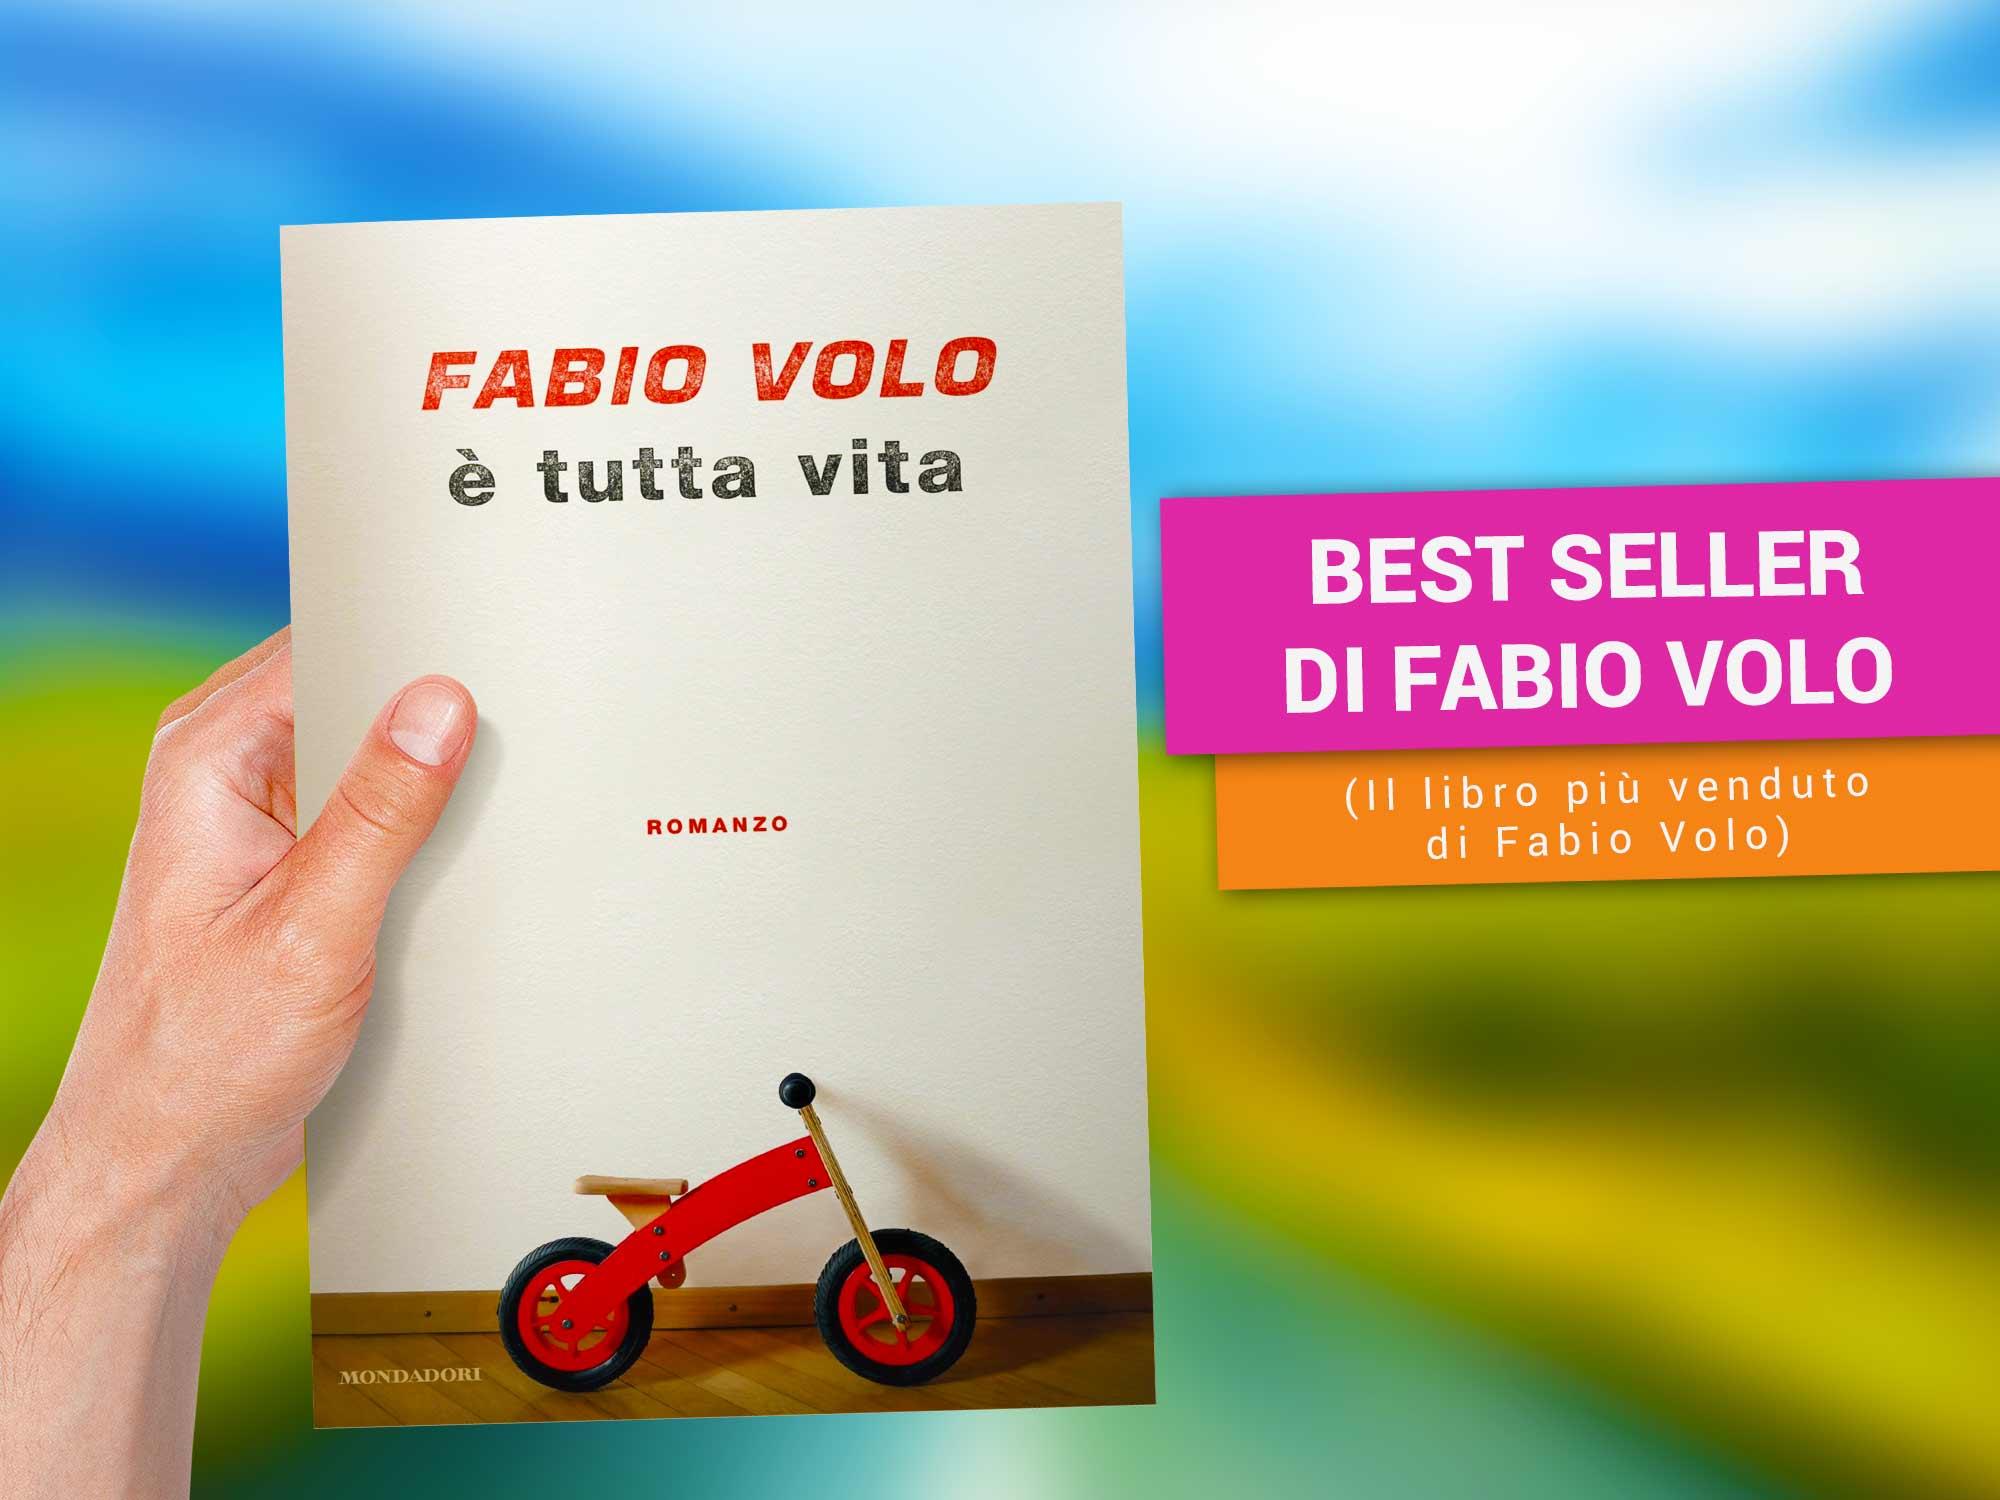 fabio-volo-best-seller